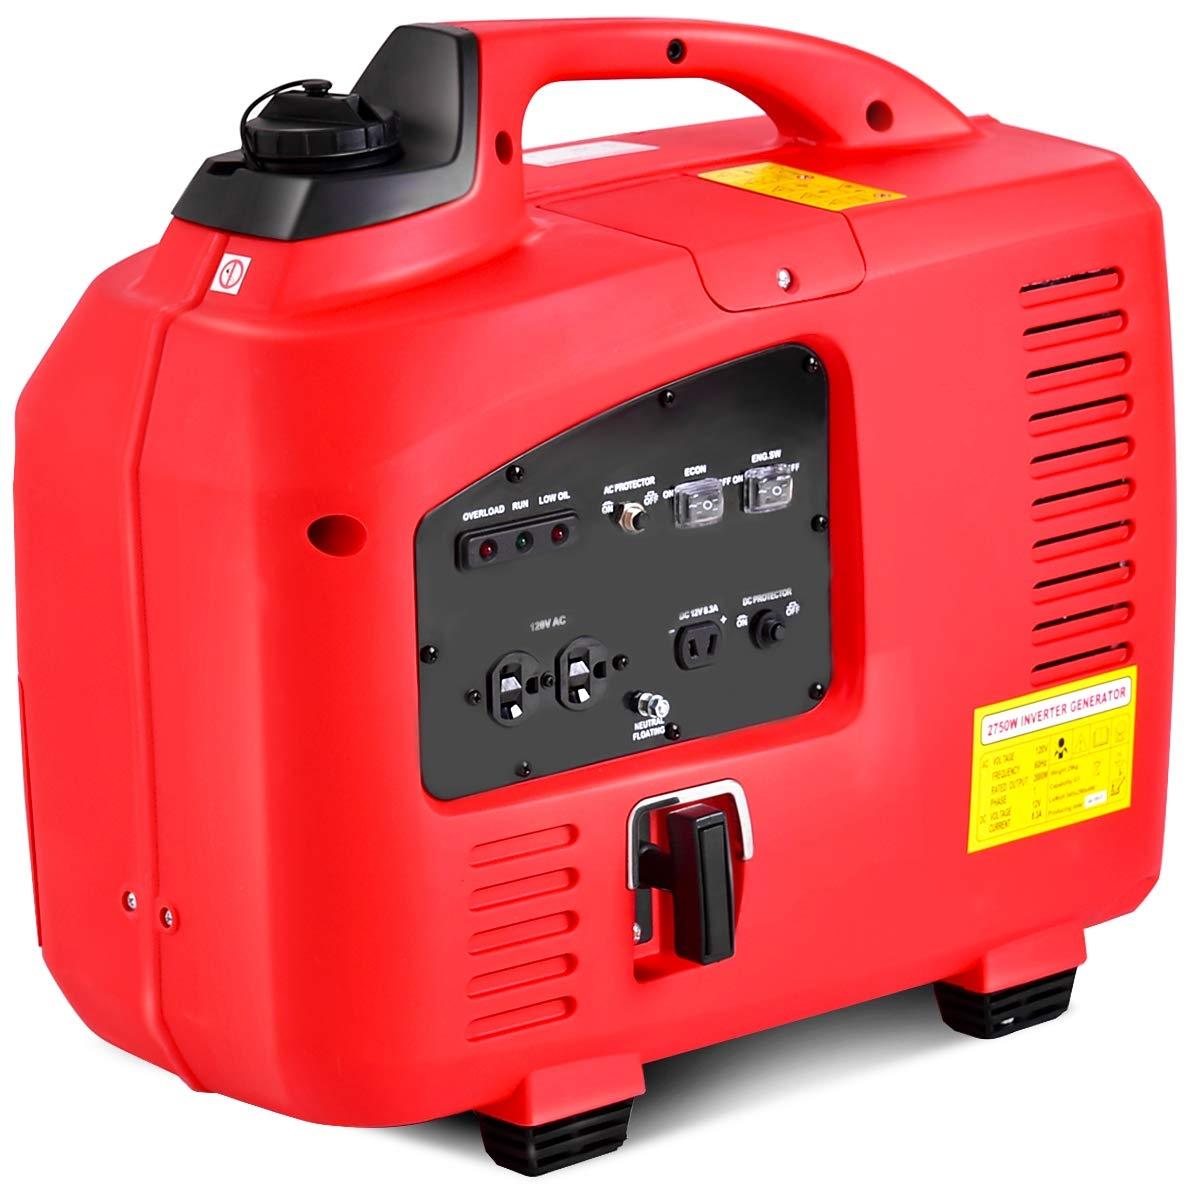 3500W Digital Inverter Generator 4 Stroke 149CC